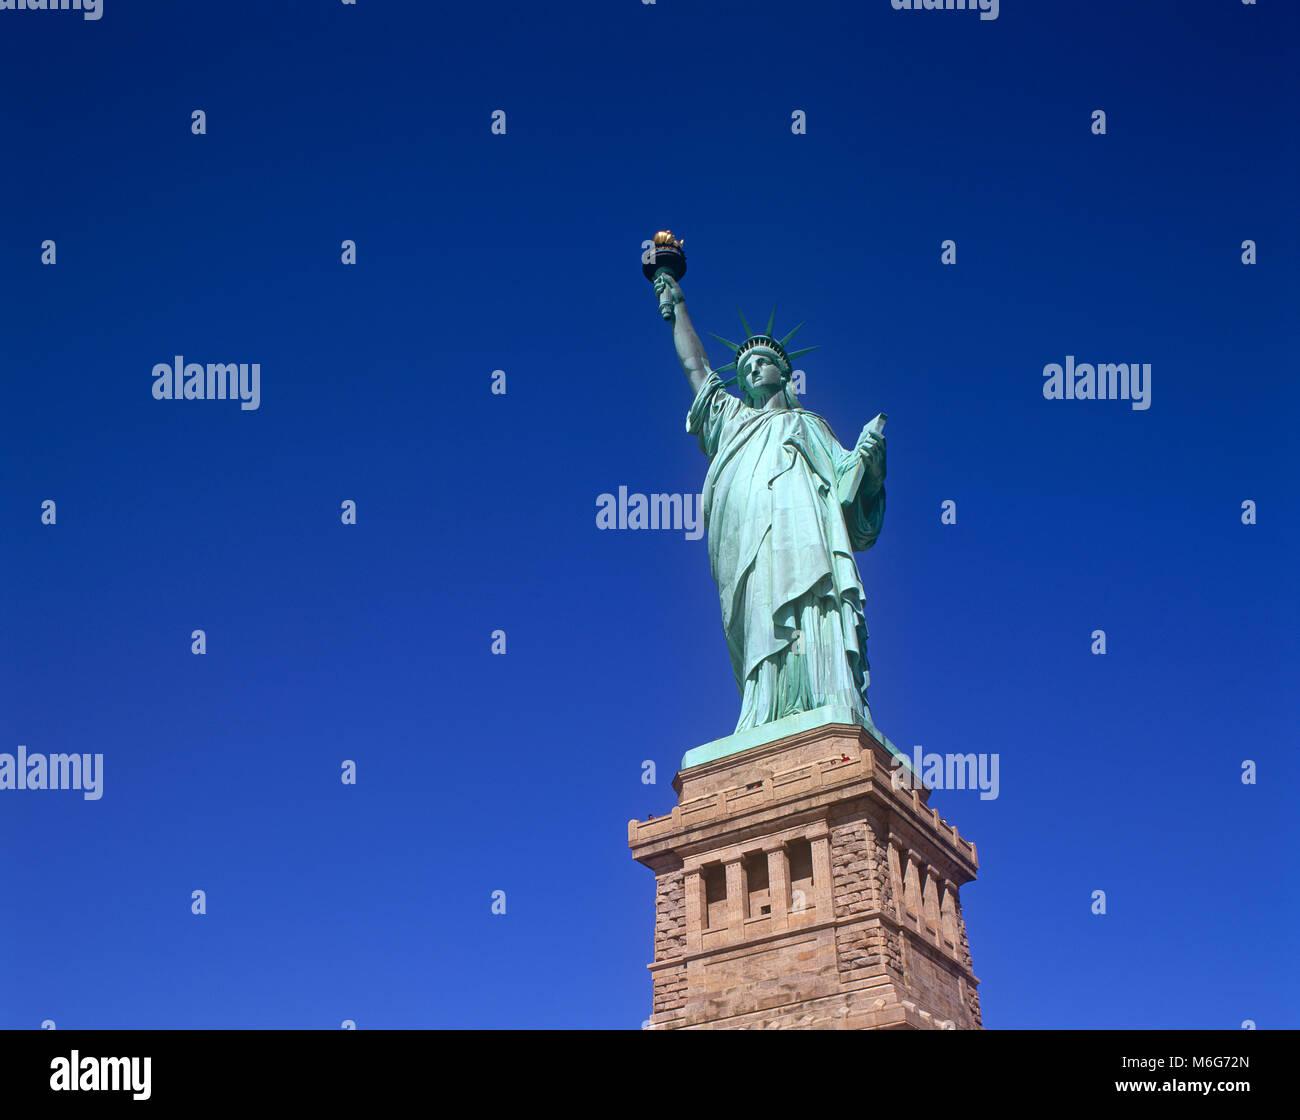 Statue de la liberté, Liberty Island, New York, USA Photo Stock